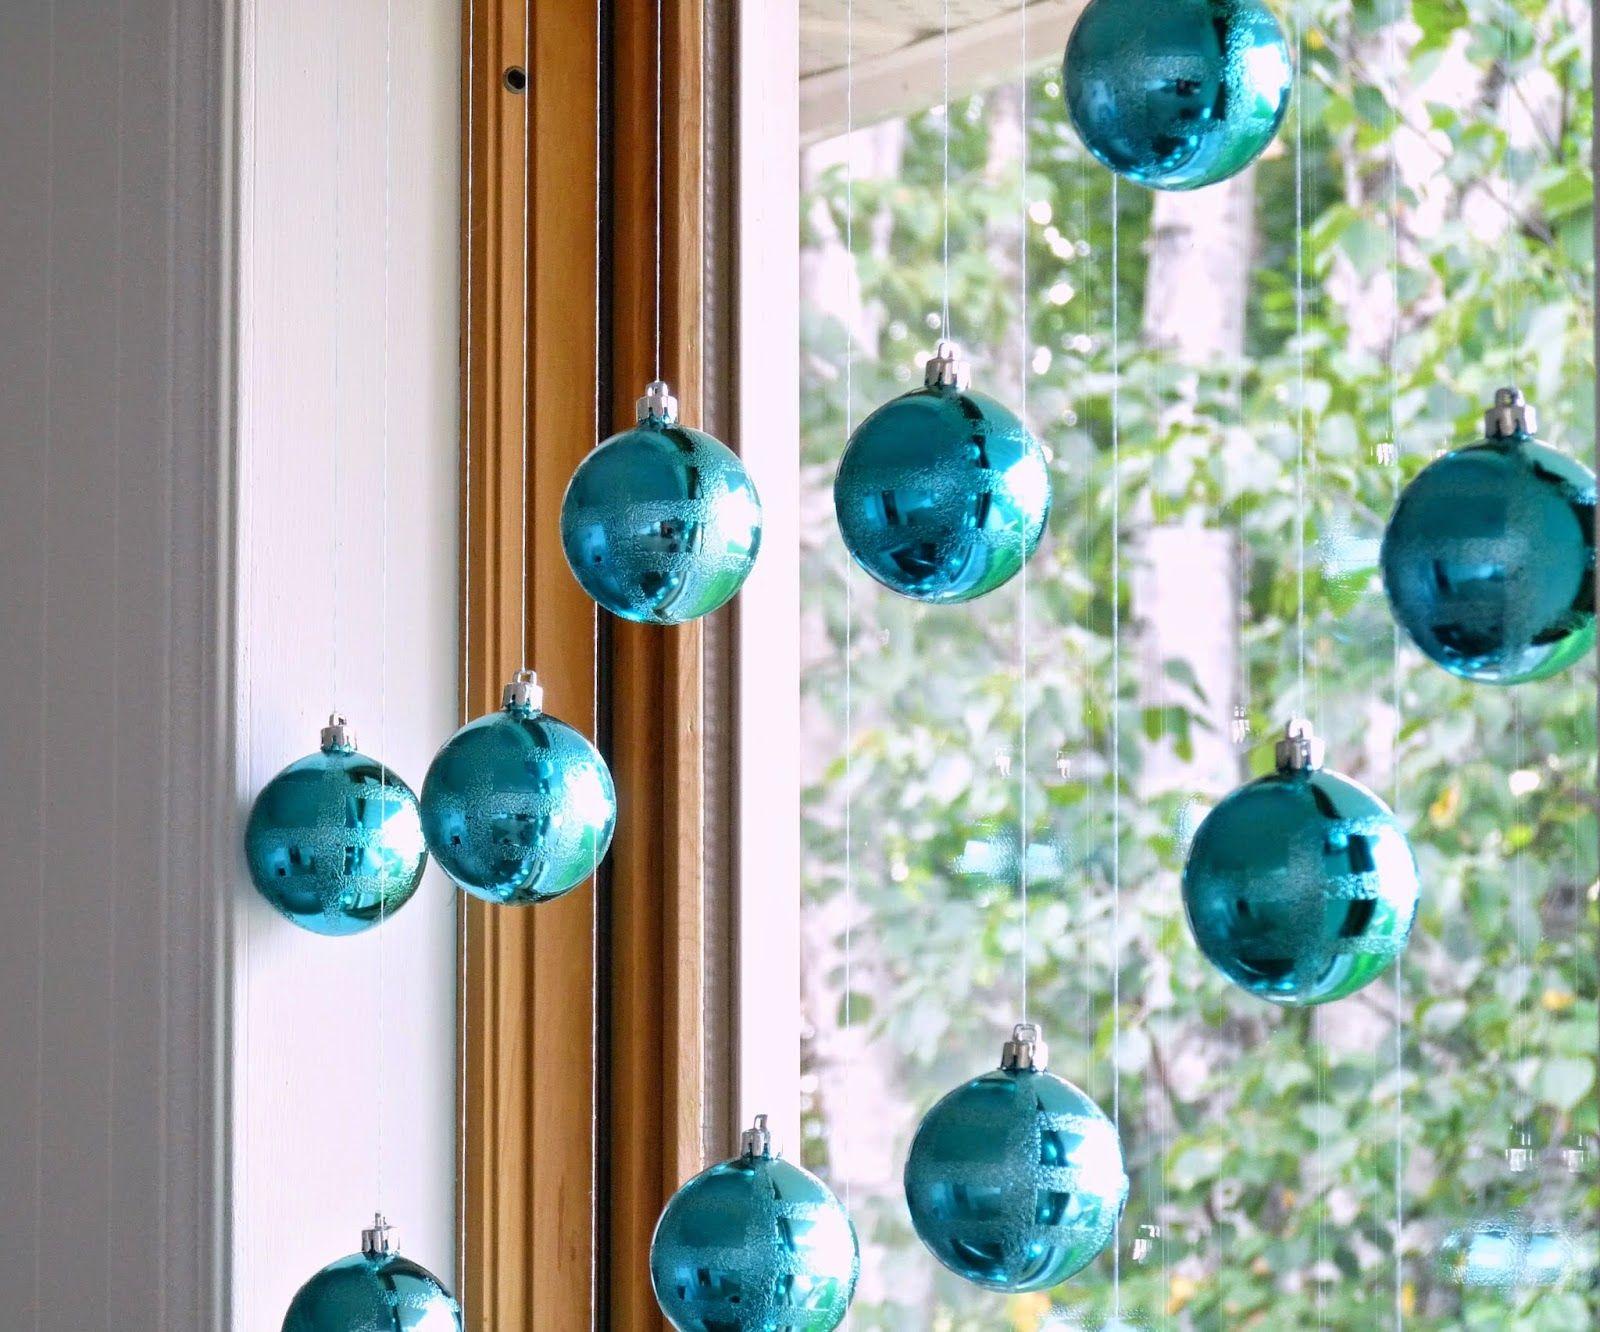 Window ornaments photo